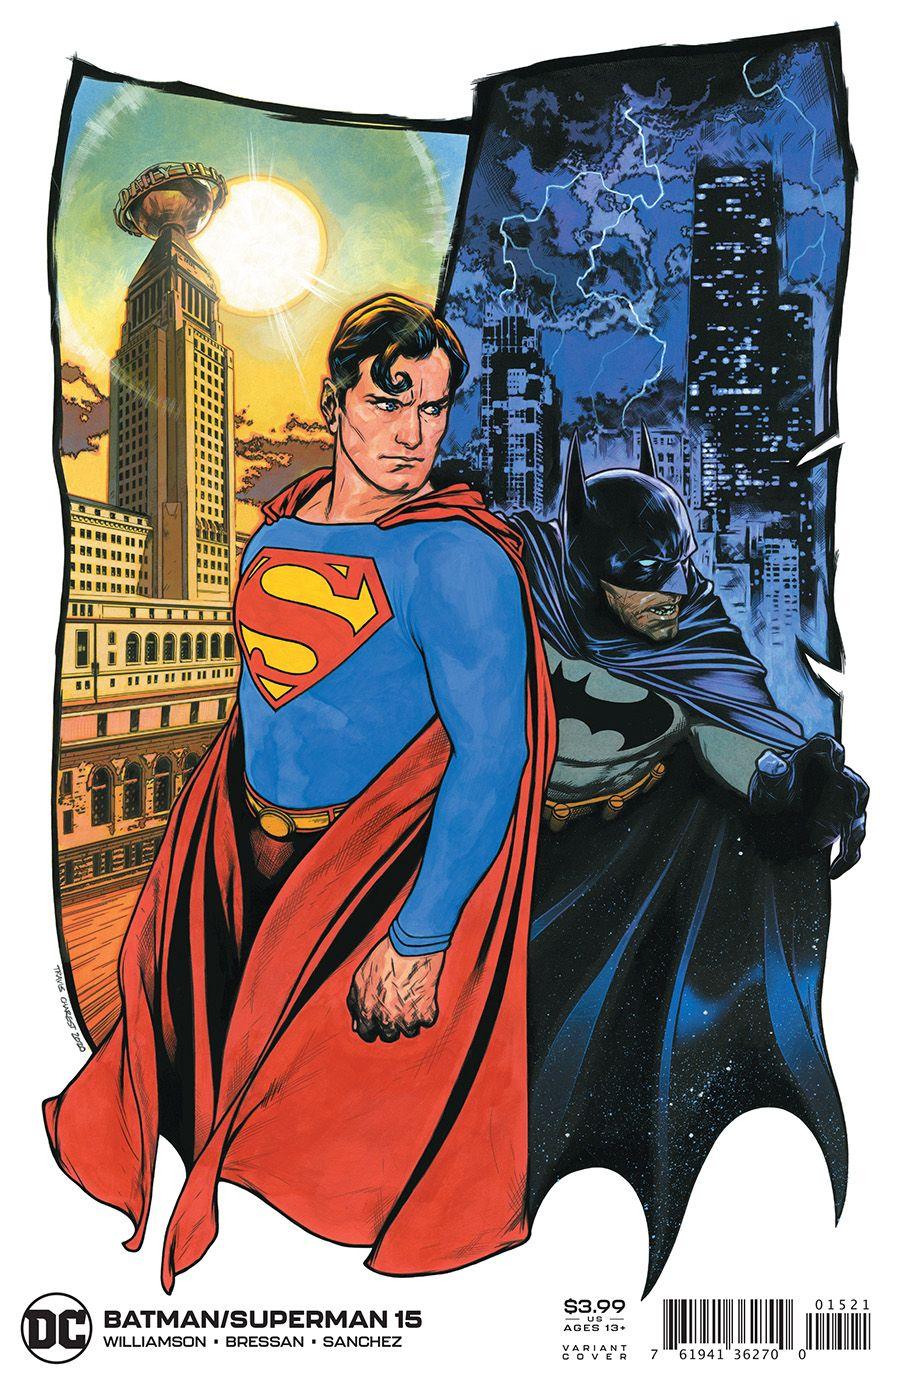 Batman/Superman #15 (Travis Charest Variant) - The Aspiring Kryptonian